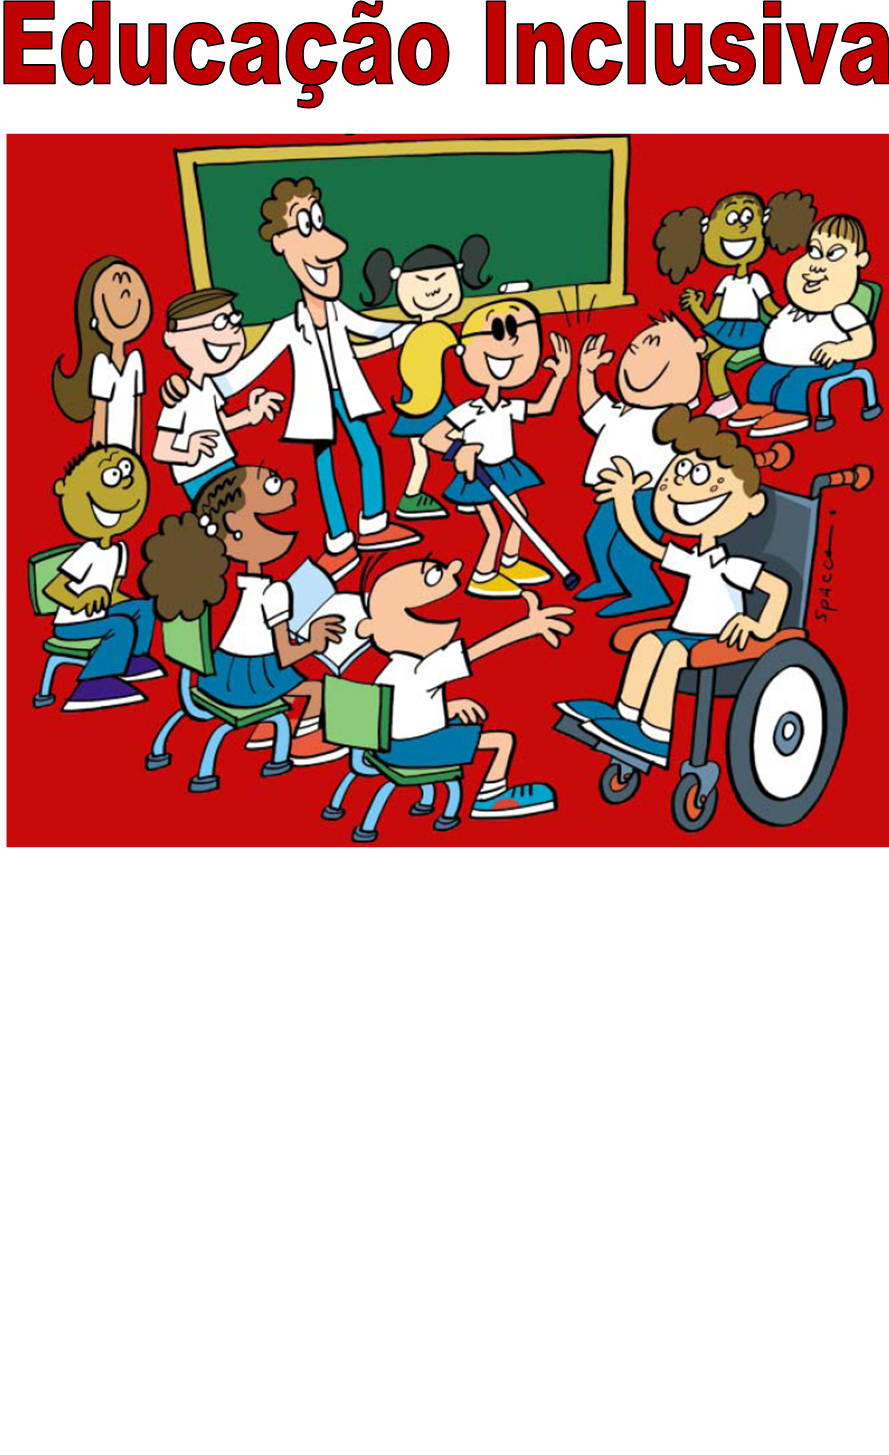 Educação Inclusiva - IPDJ